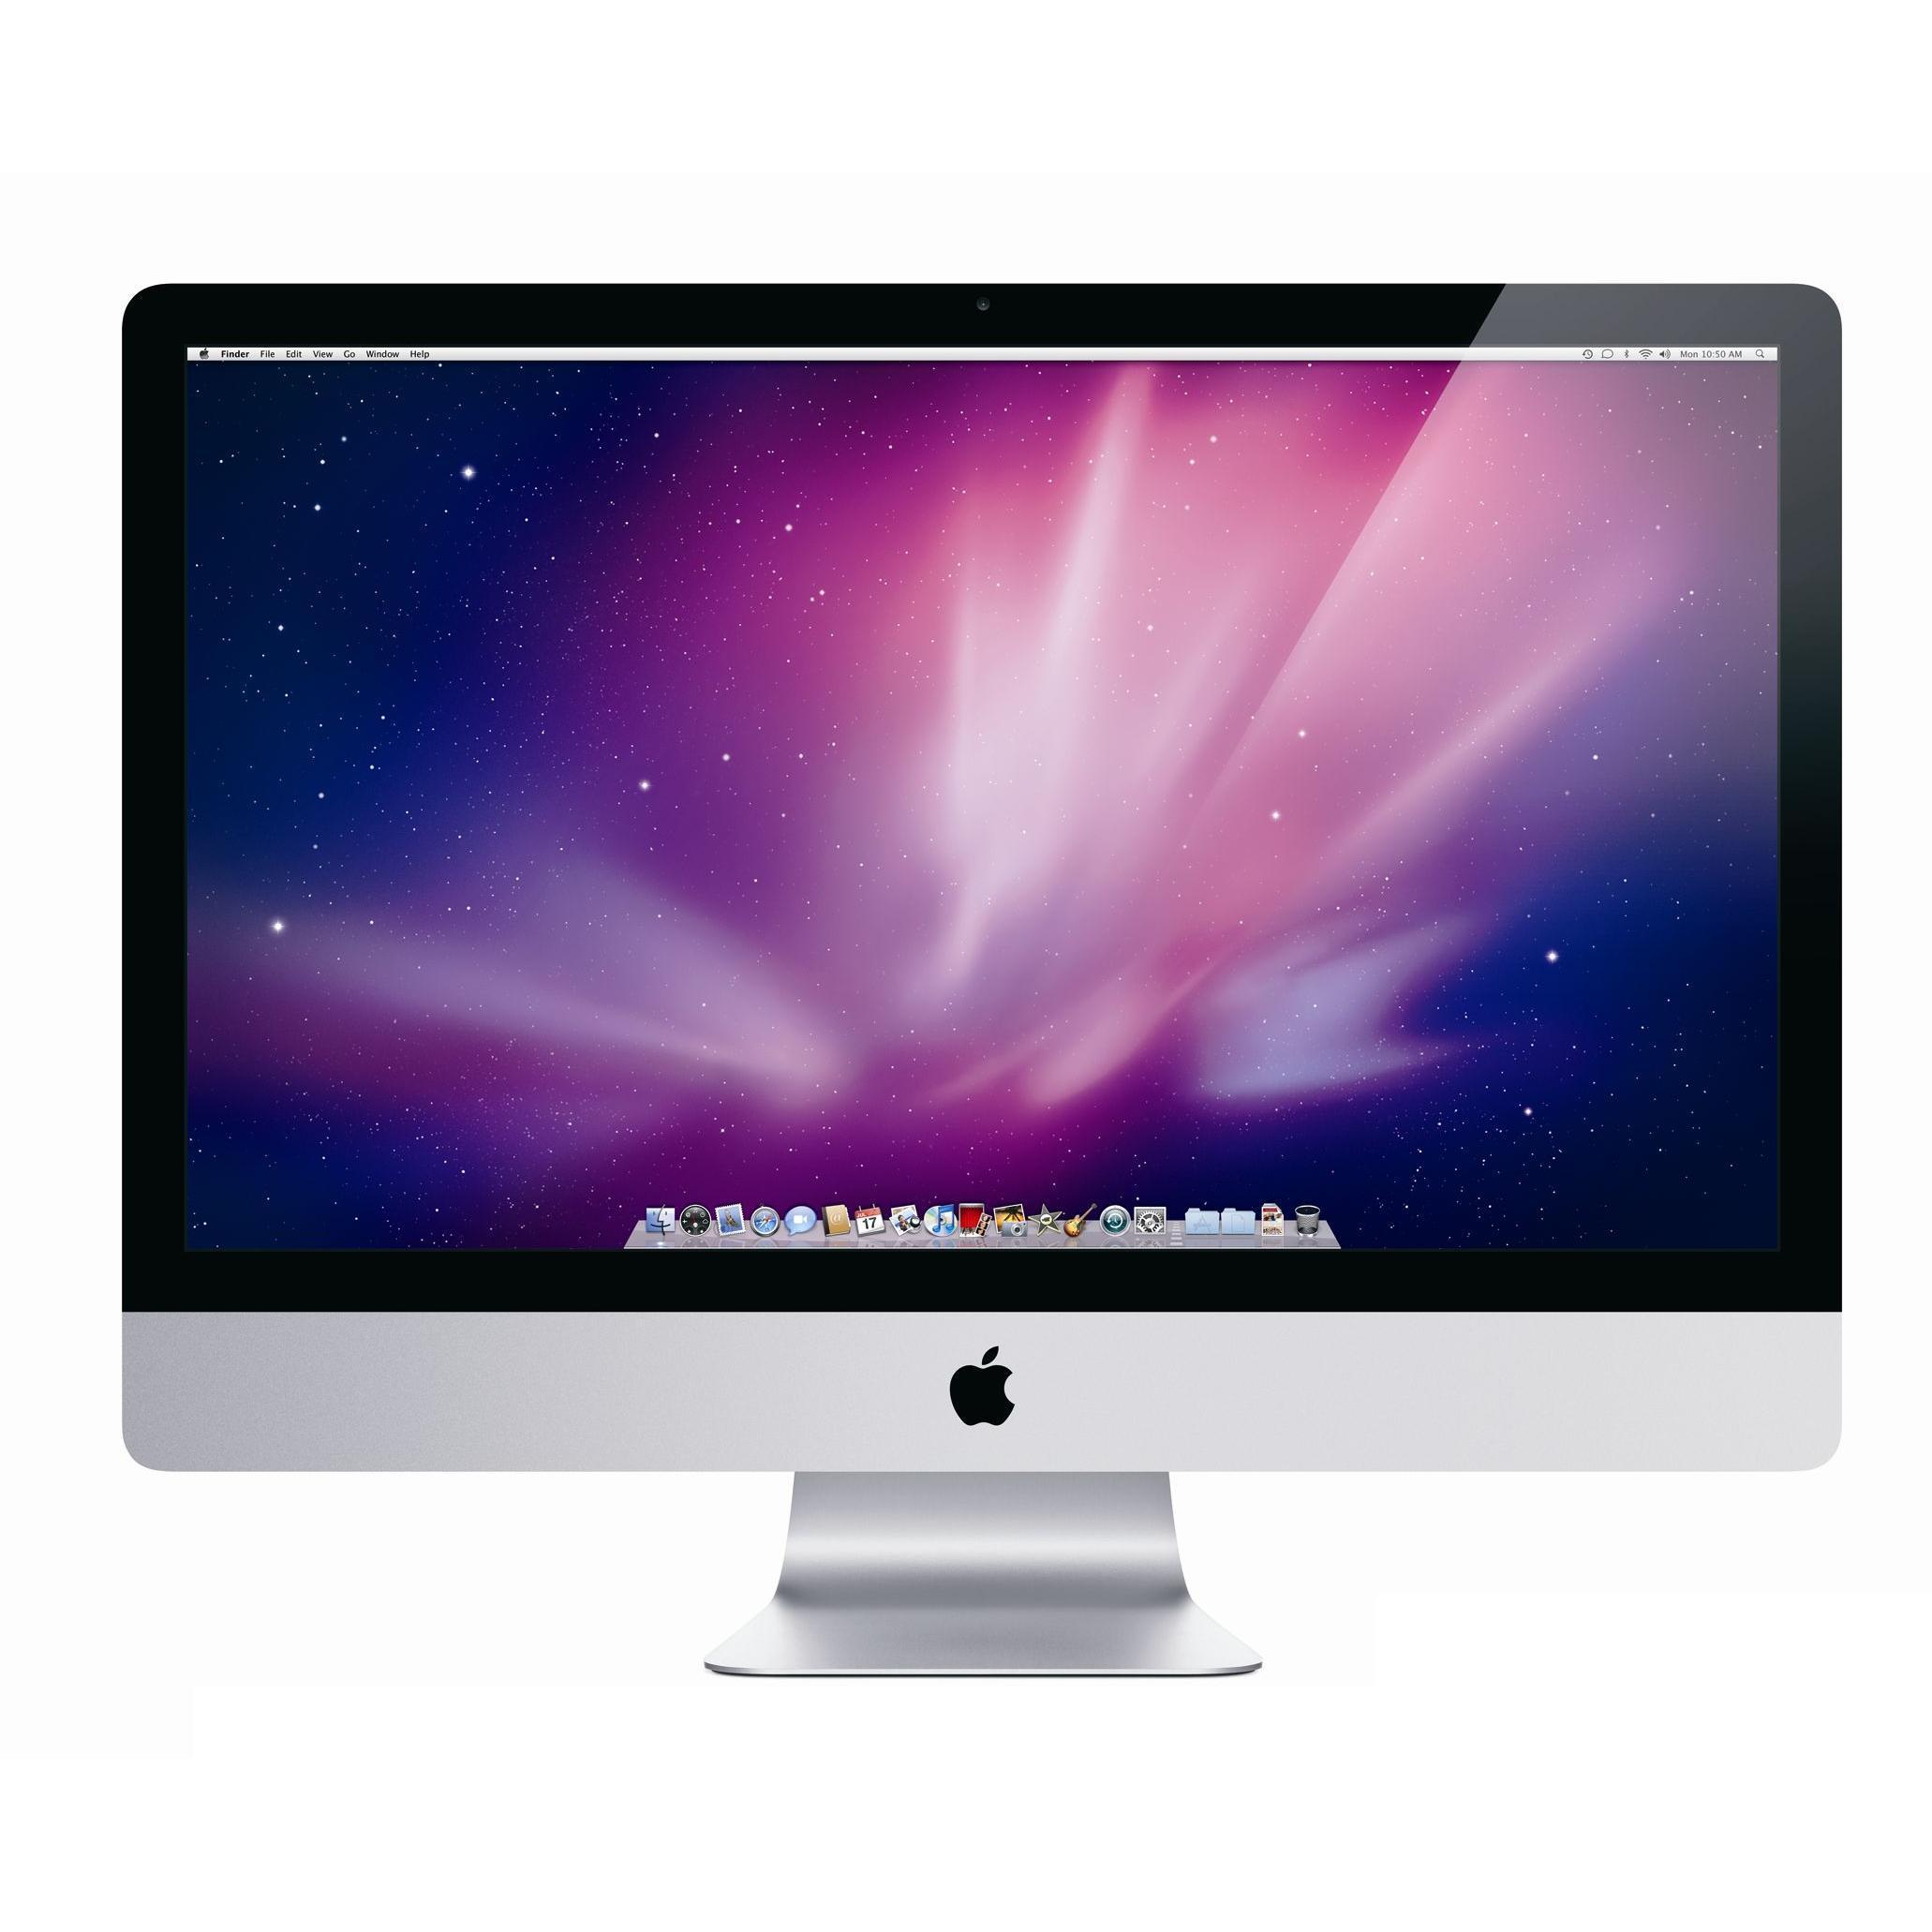 iMac 27-inch (Mid-2011) Core i5 3.1GHz - HDD 1 TB - 8GB AZERTY - French